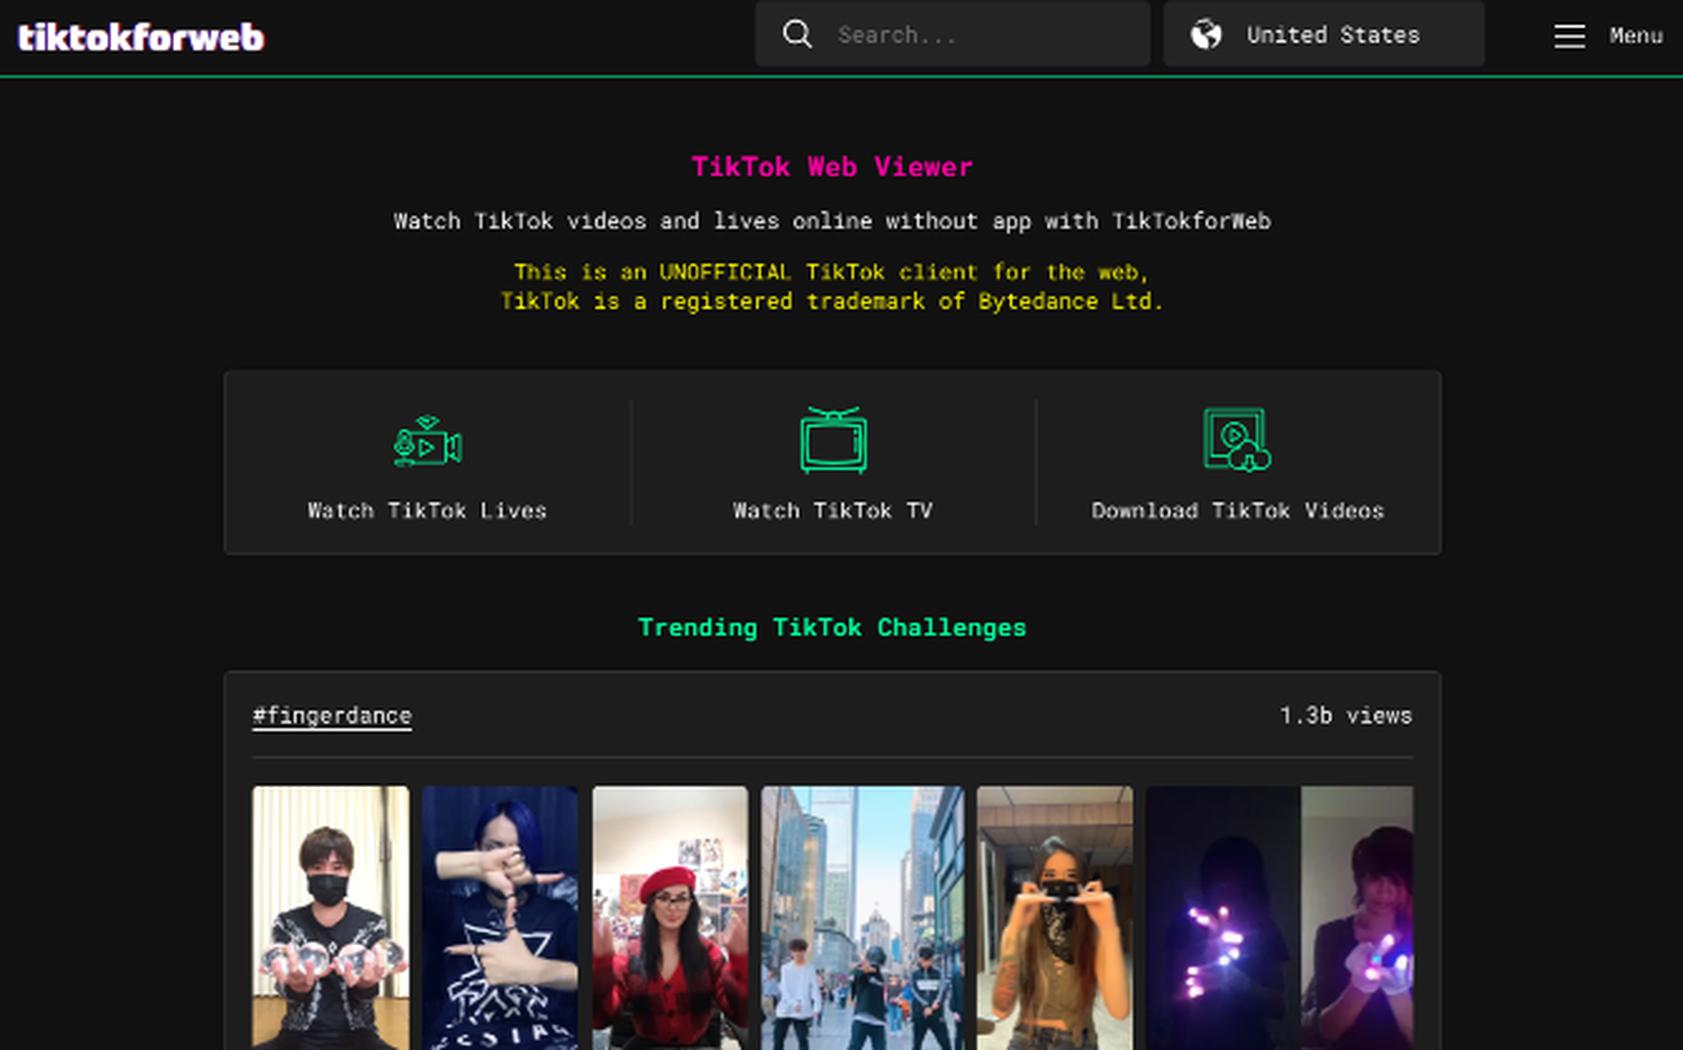 TikTok 的非官方 Web 客户端